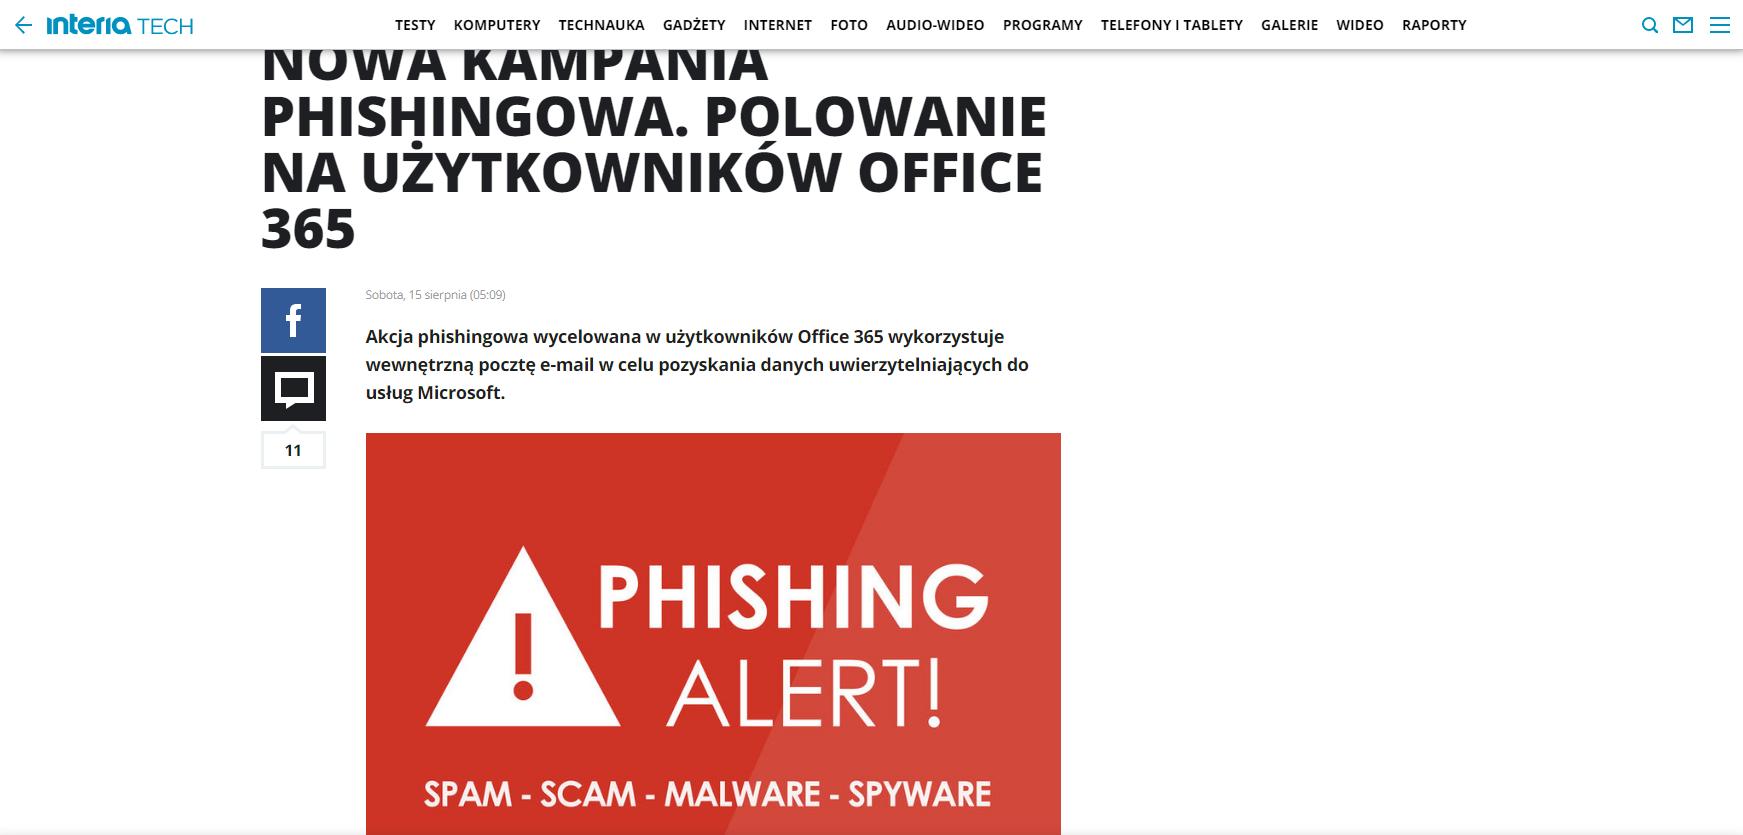 Nowa kampania phishingowa